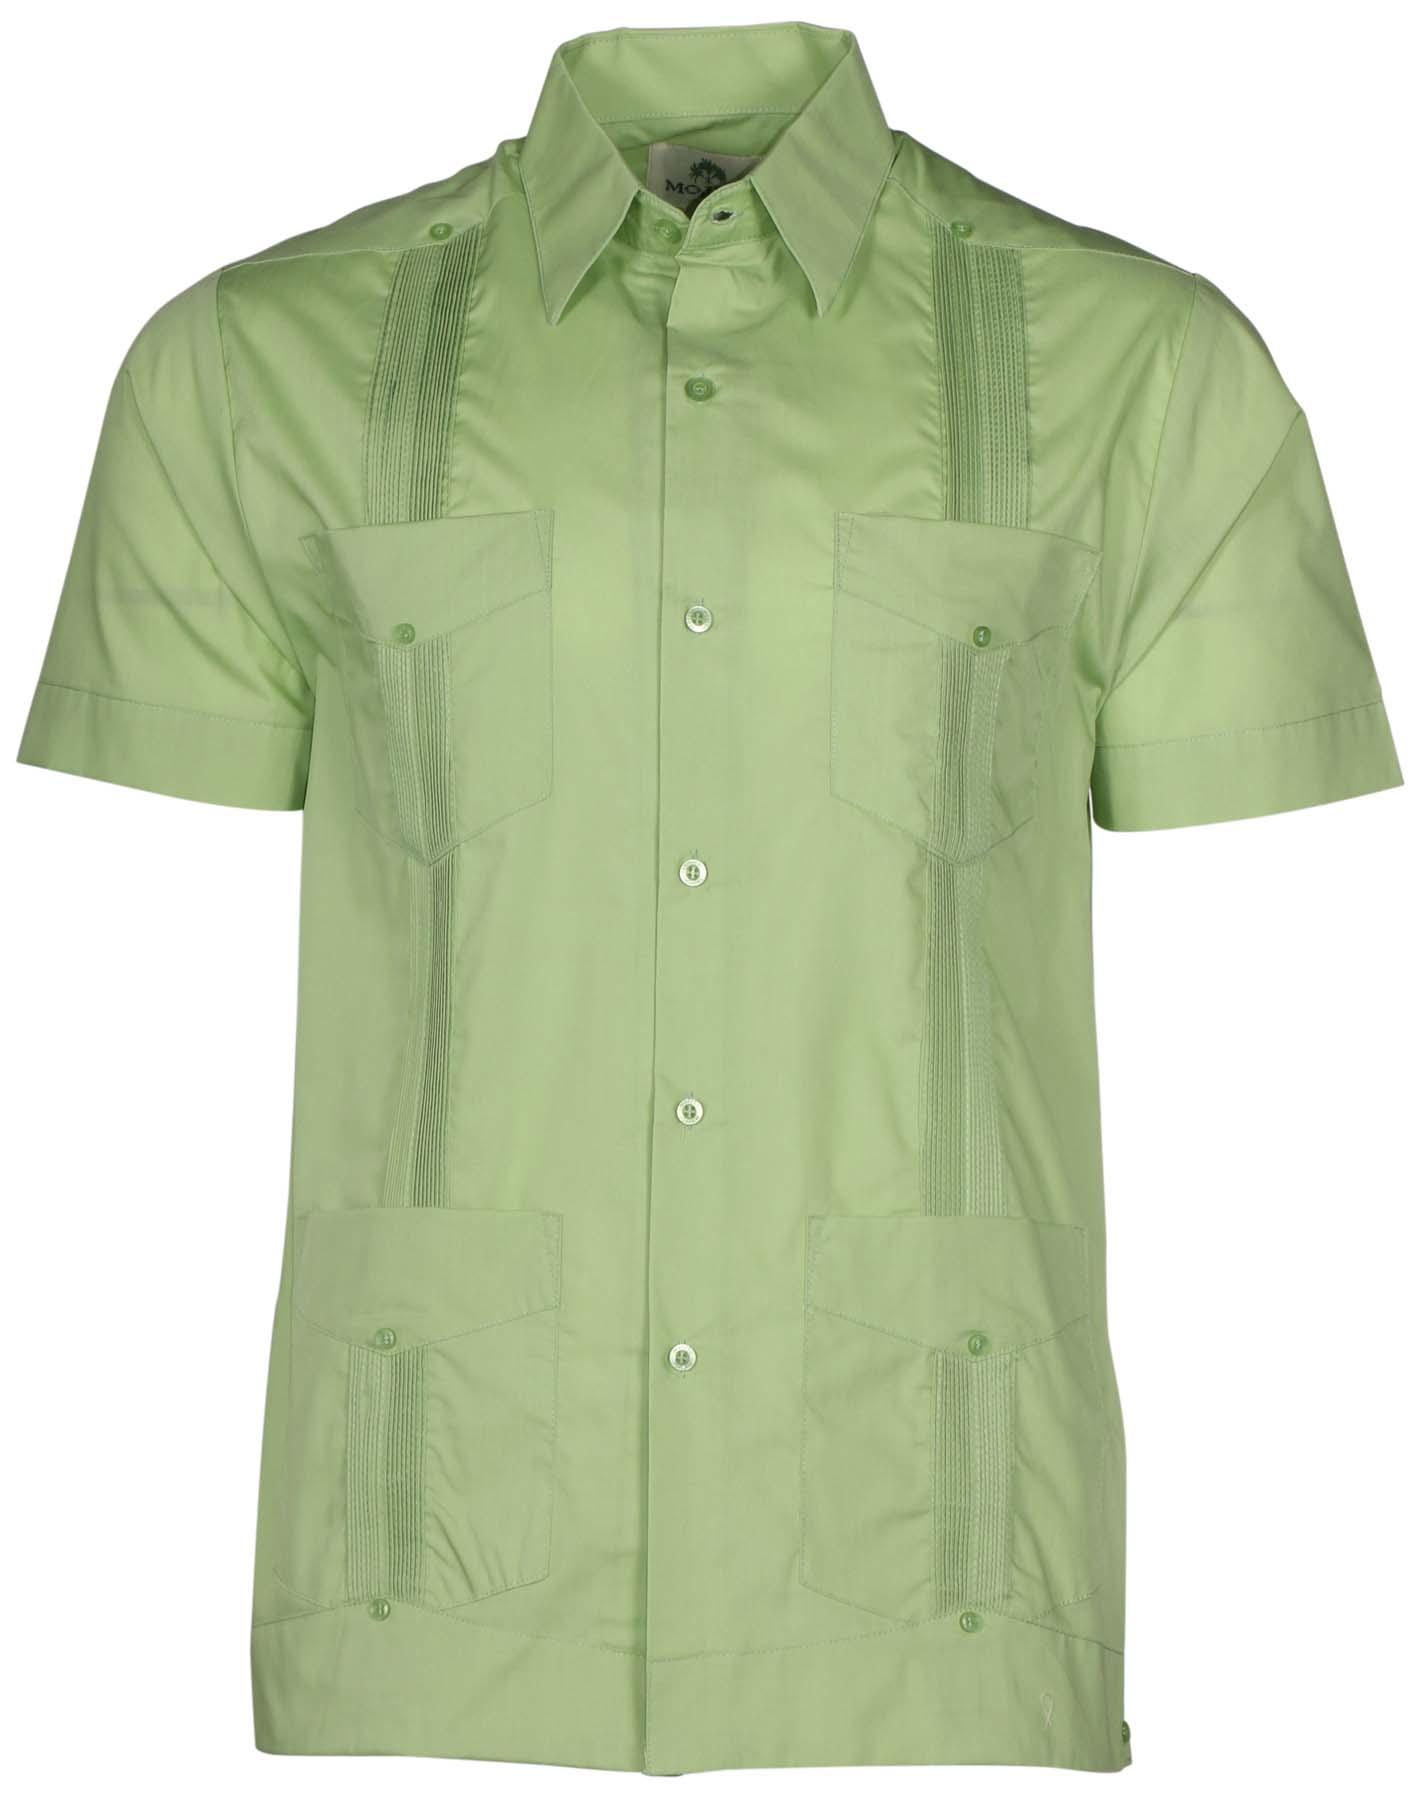 Mojito Collection Men S Short Sleeve Guayabera Shirt Ebay